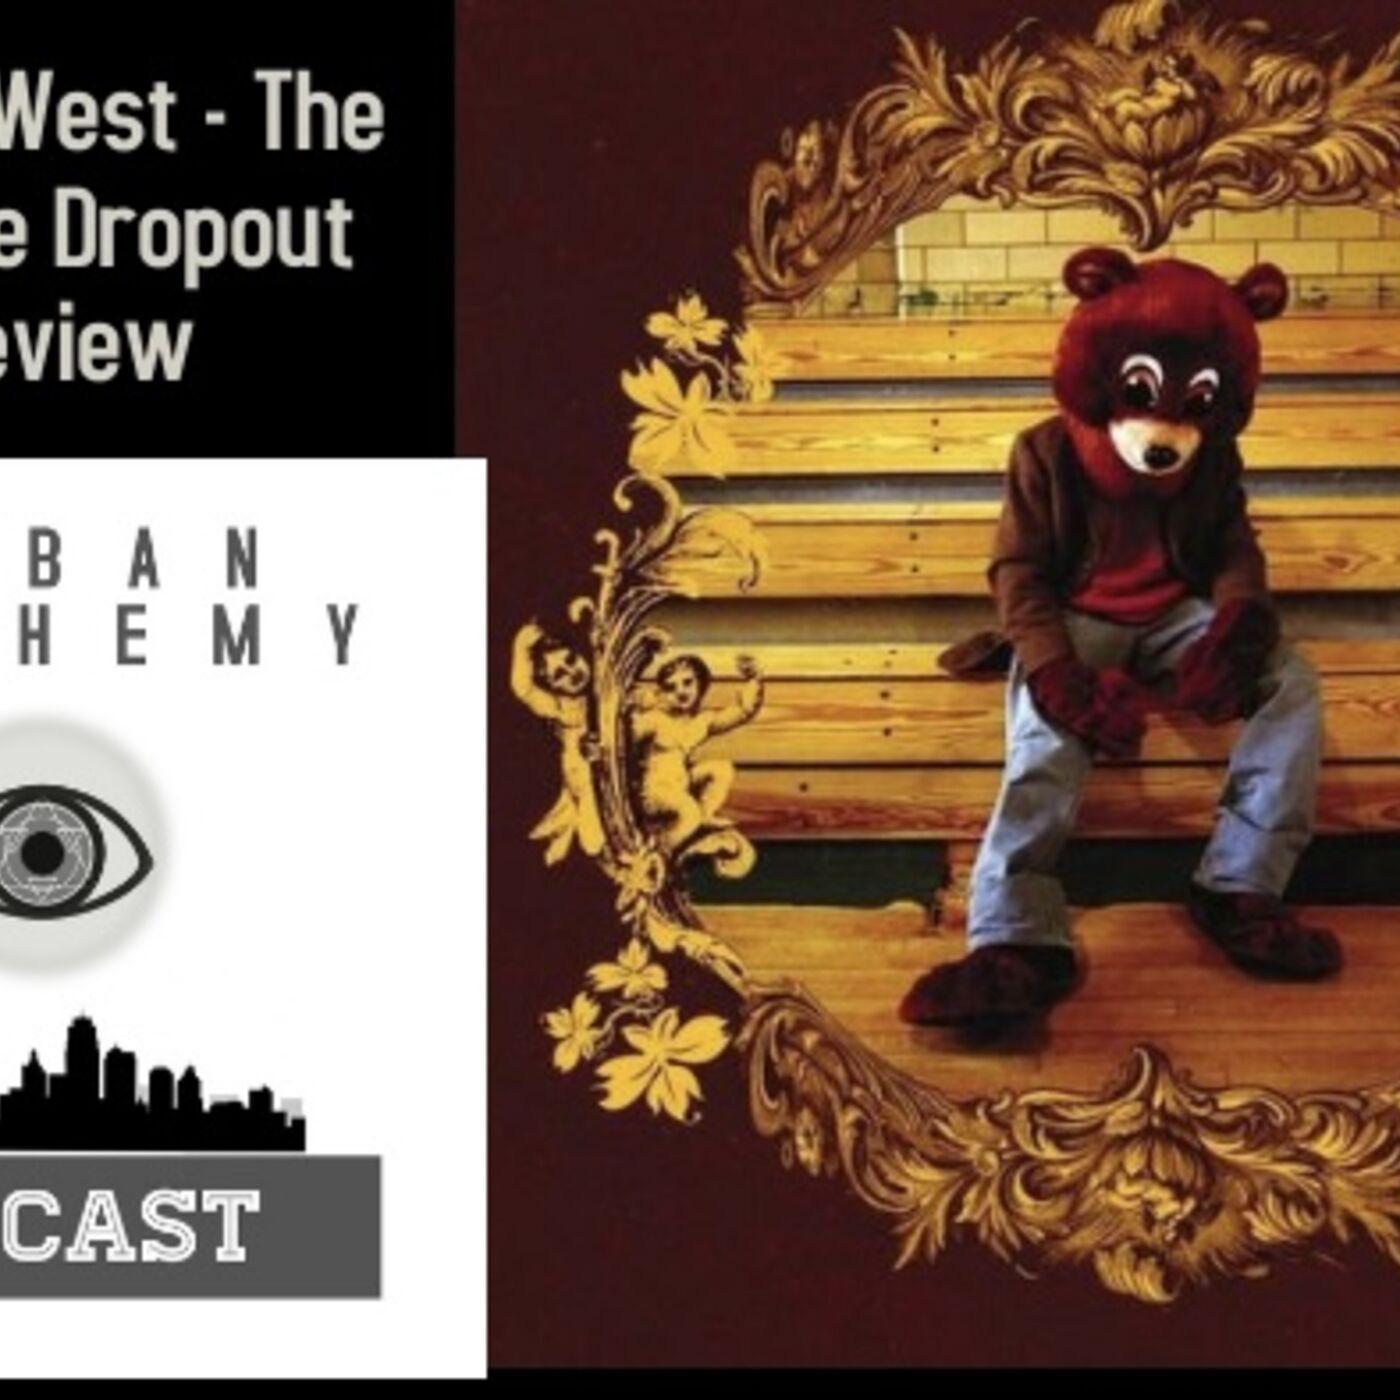 The College Dropout - Albulm Review